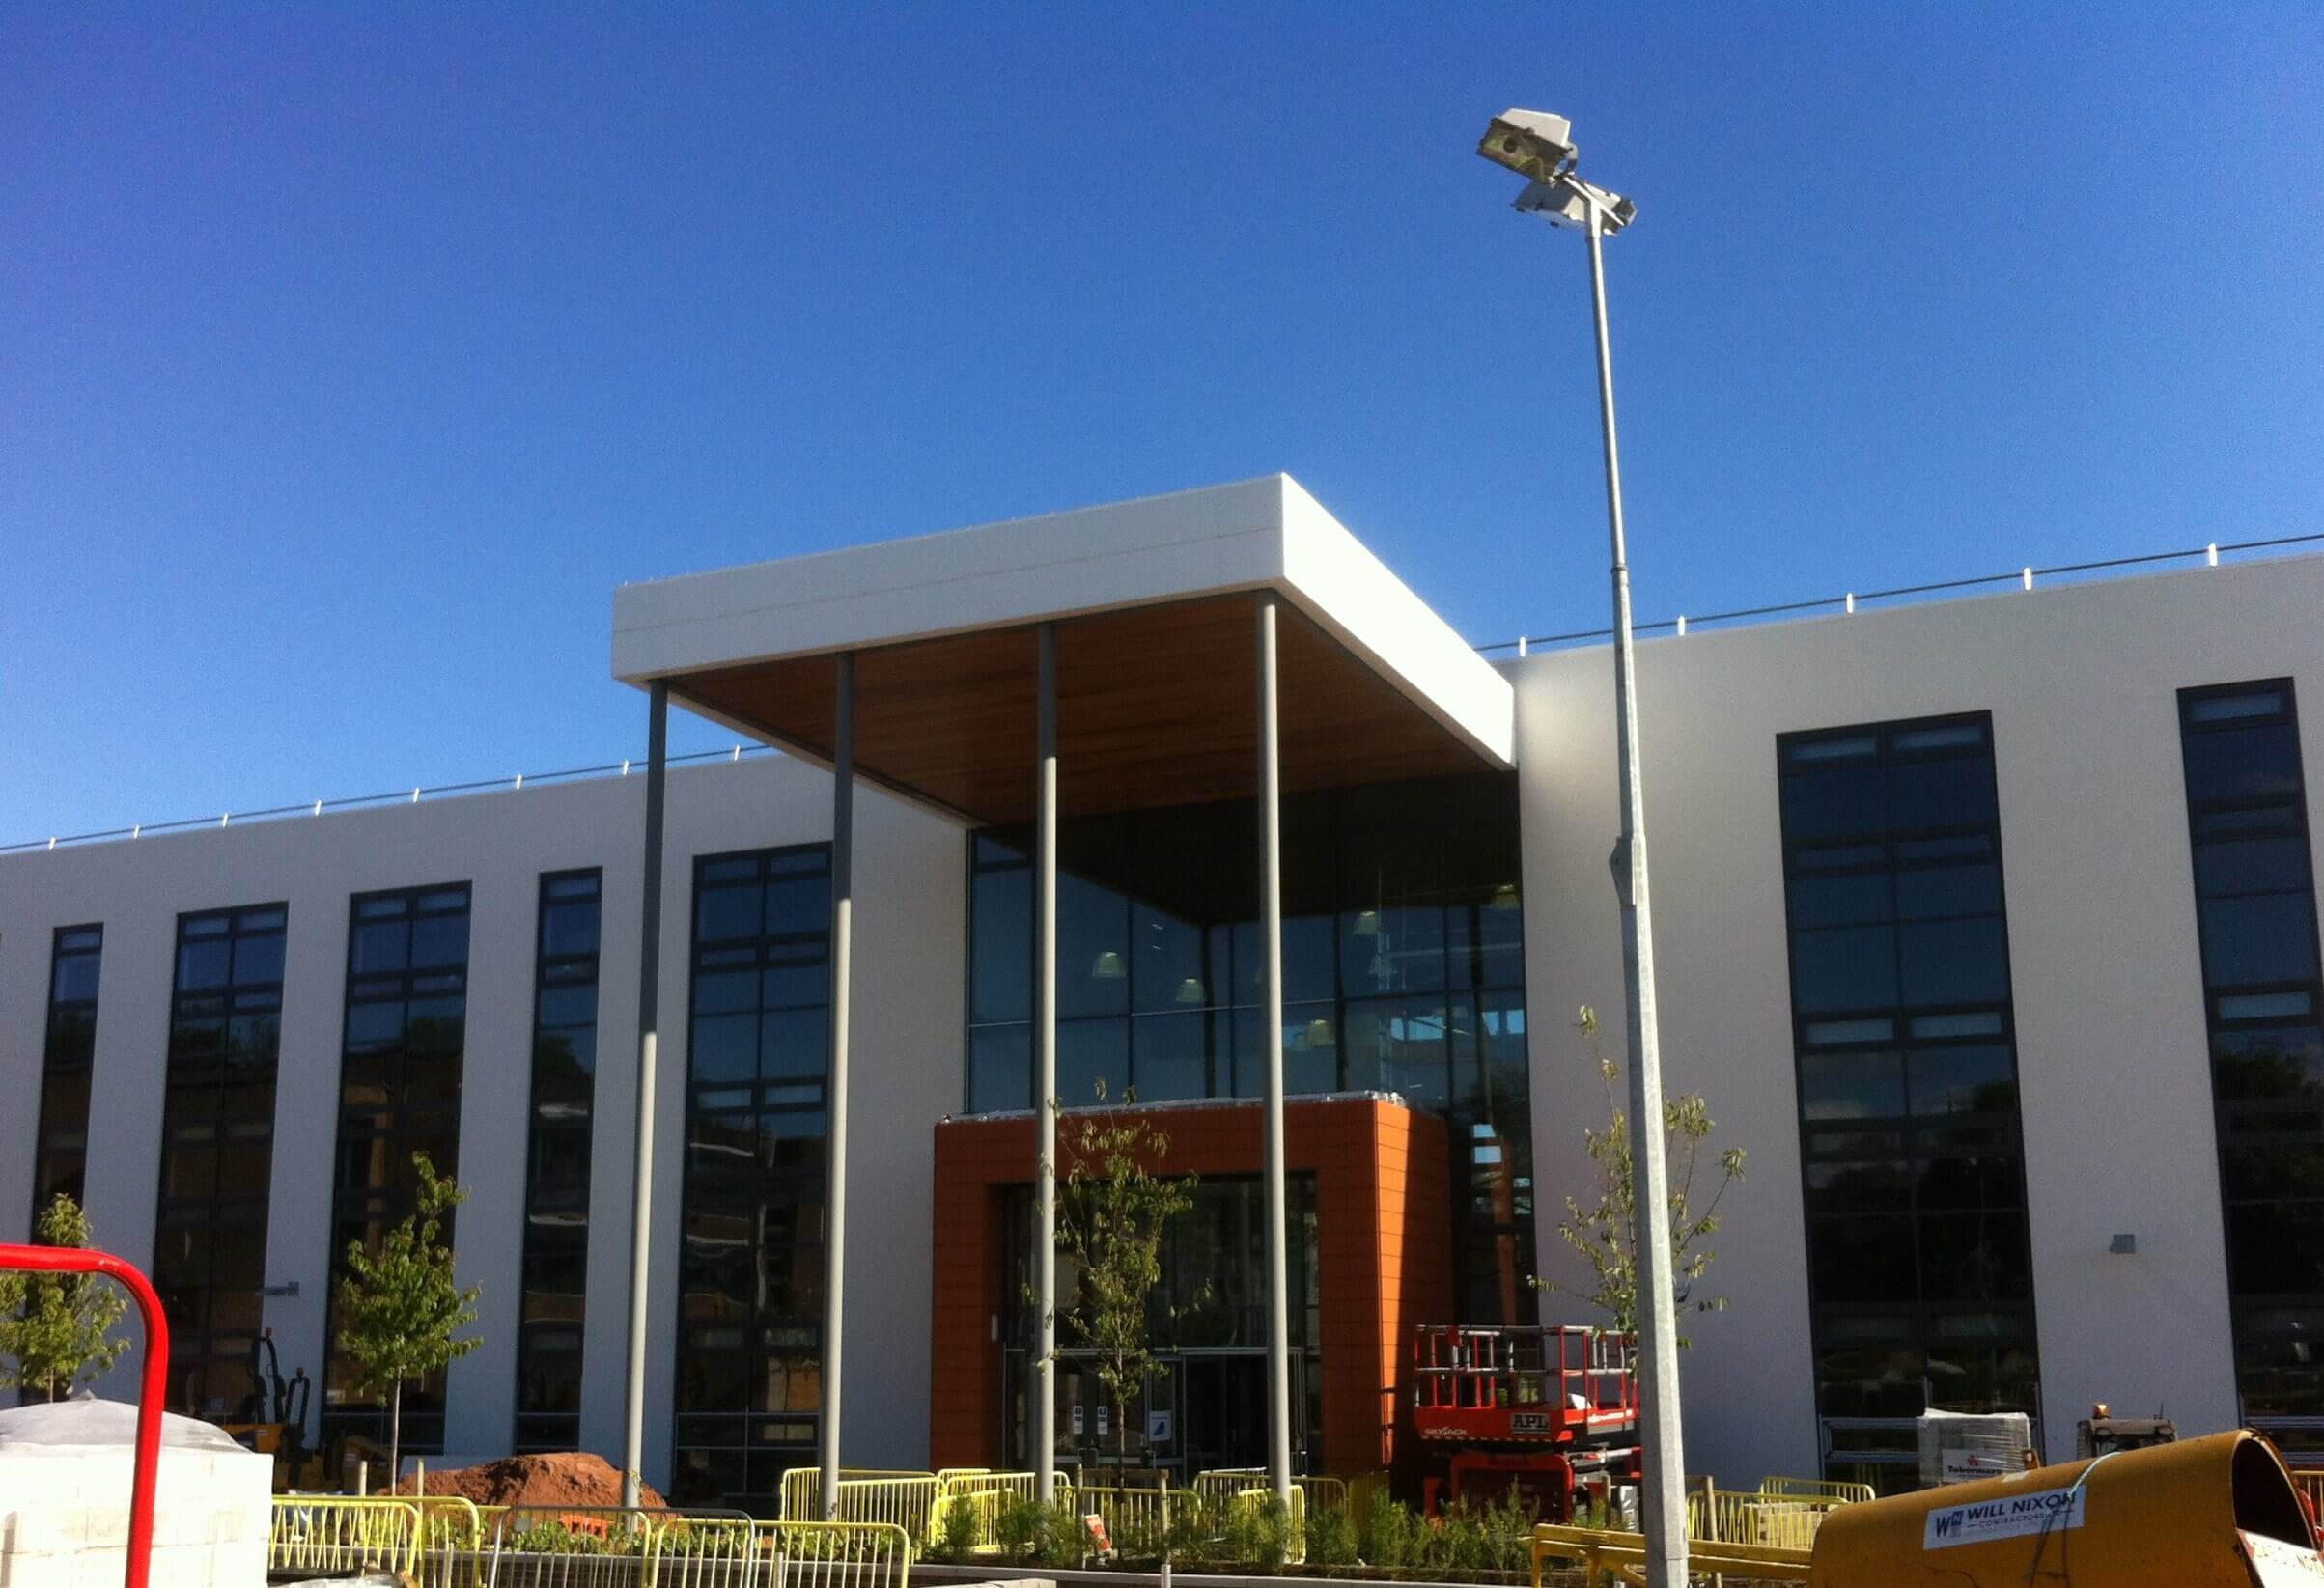 Cauldon Campus 4